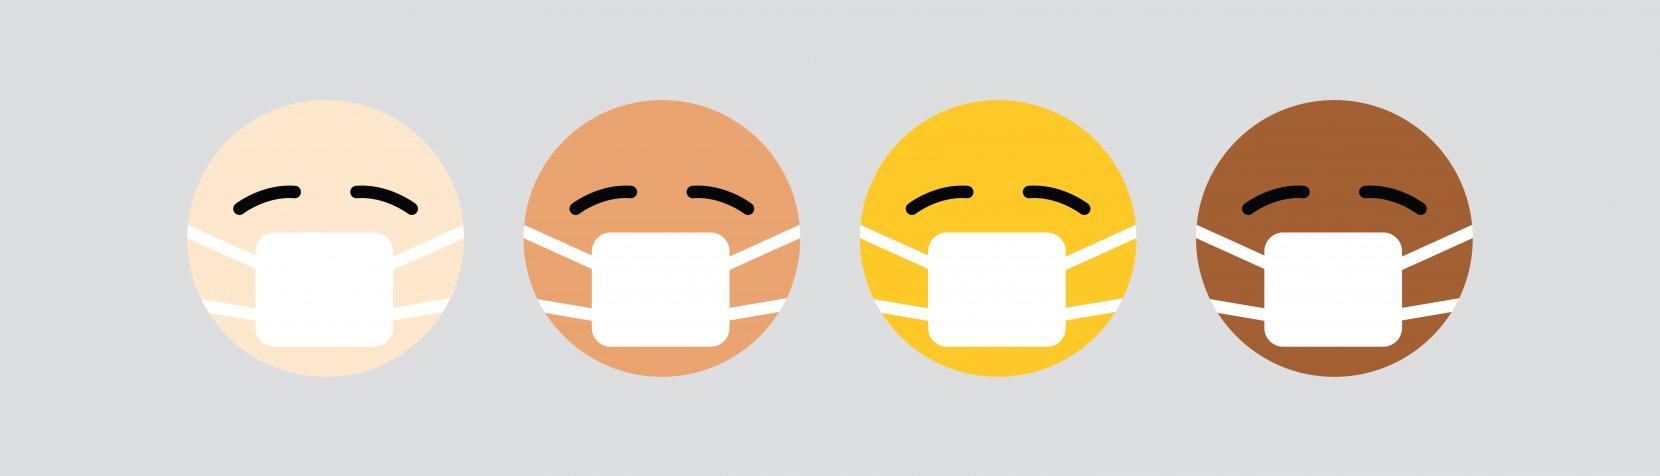 Mundbind emojis